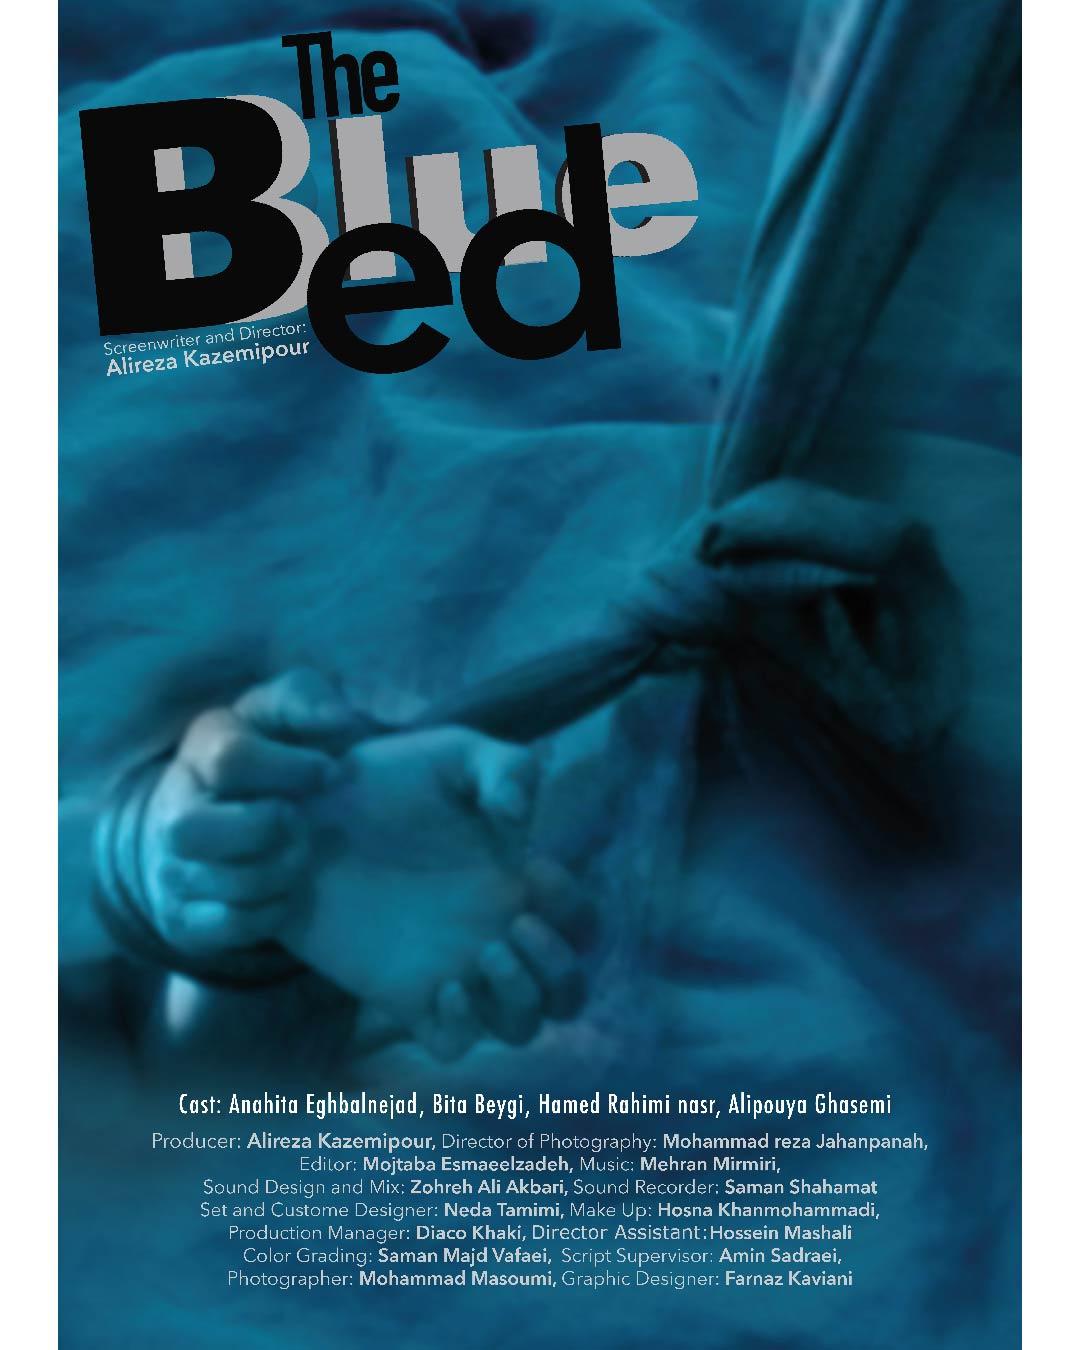 hexagon film festival the blue bed